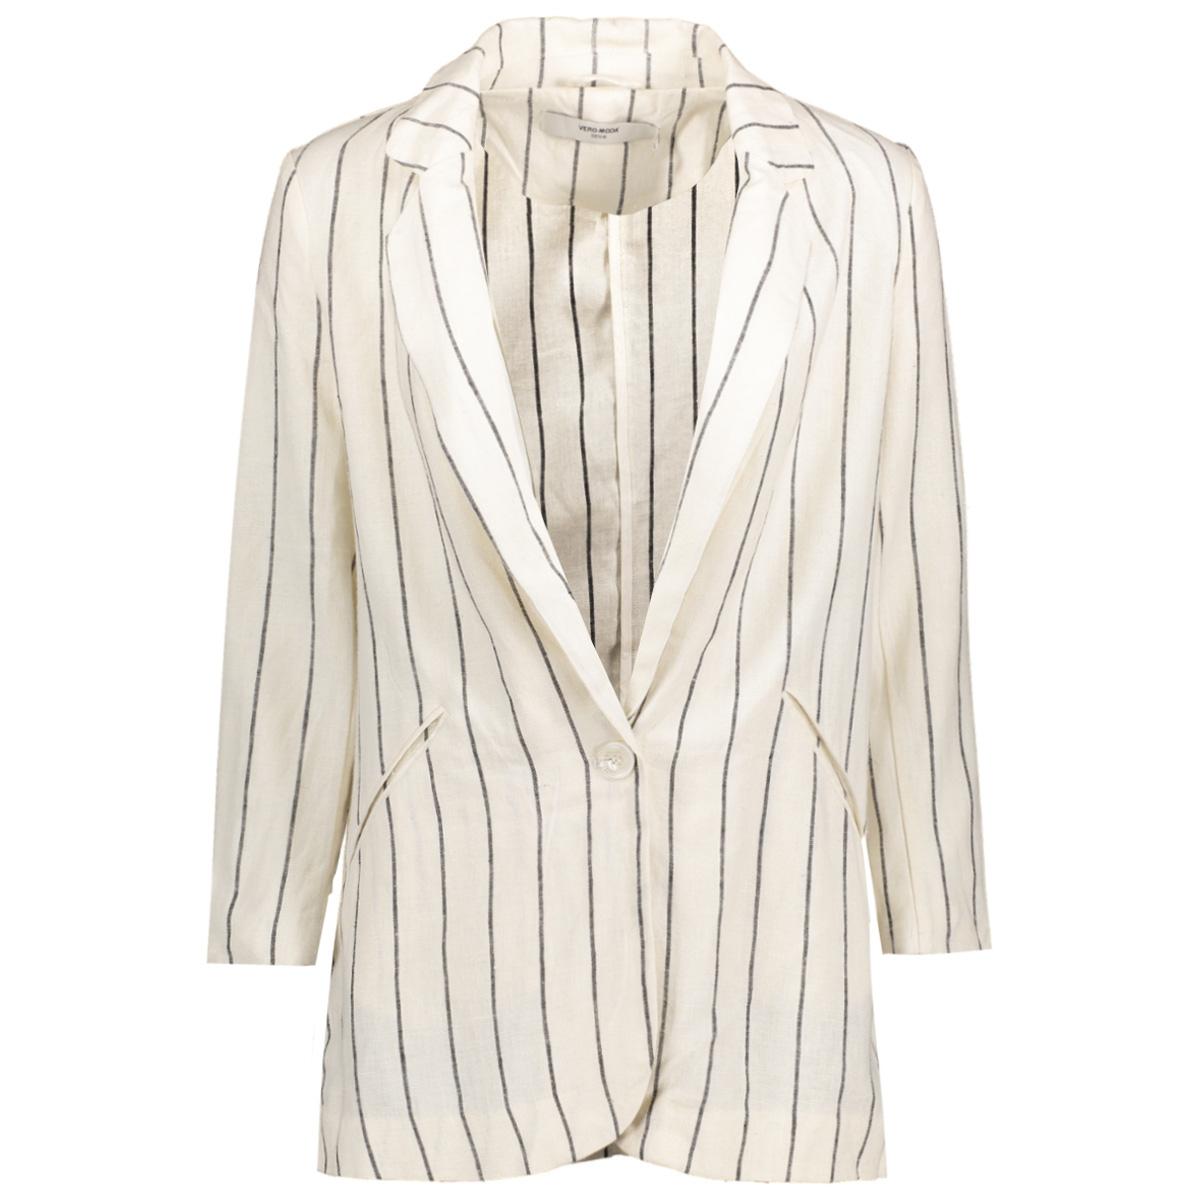 vmnaja 7/8 blazer dnm 10174743 vero moda blazer snow white/black